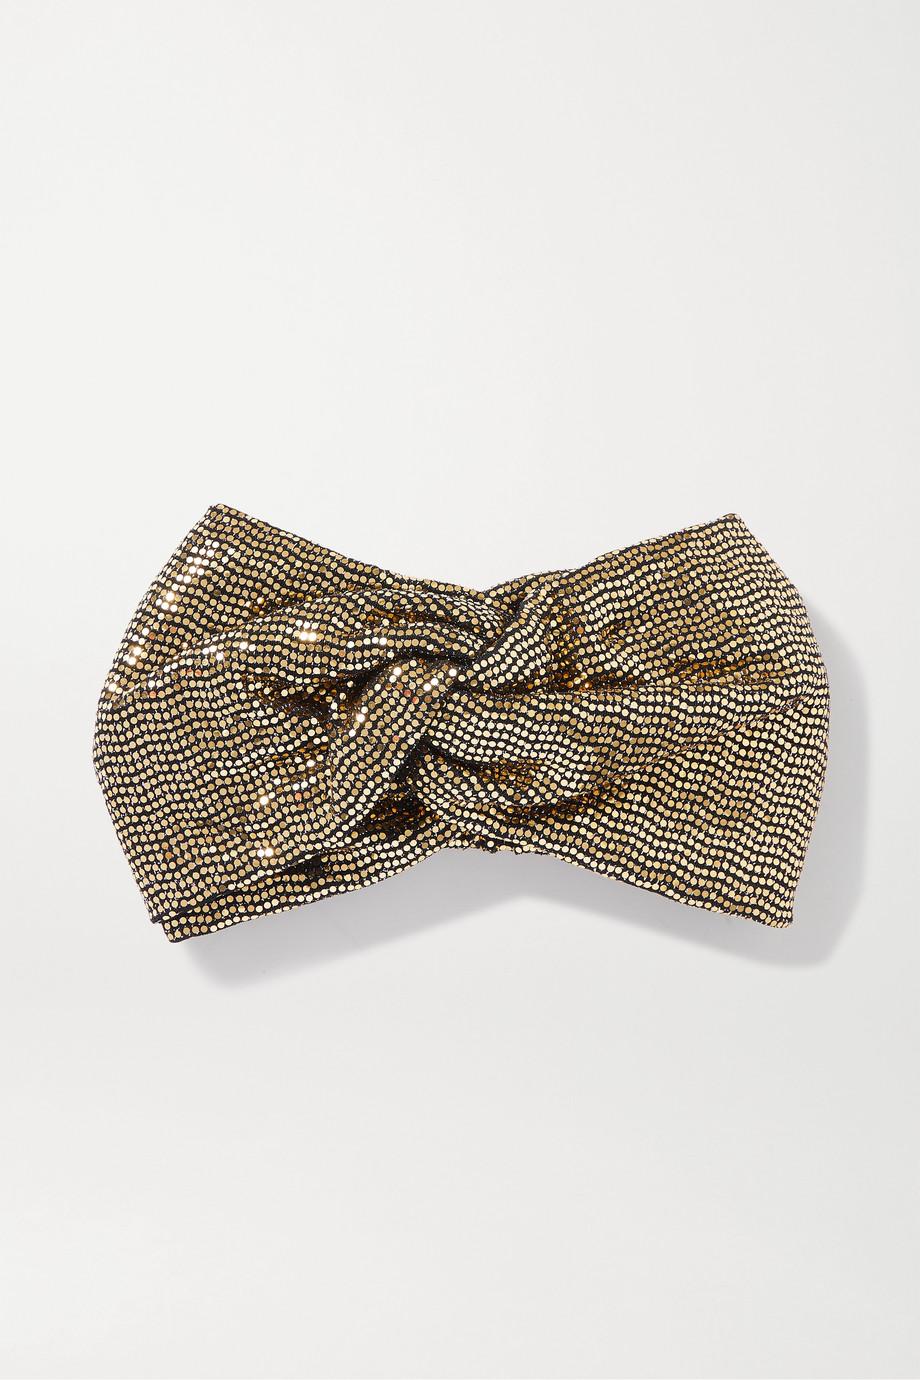 Gucci Twisted lamé headband